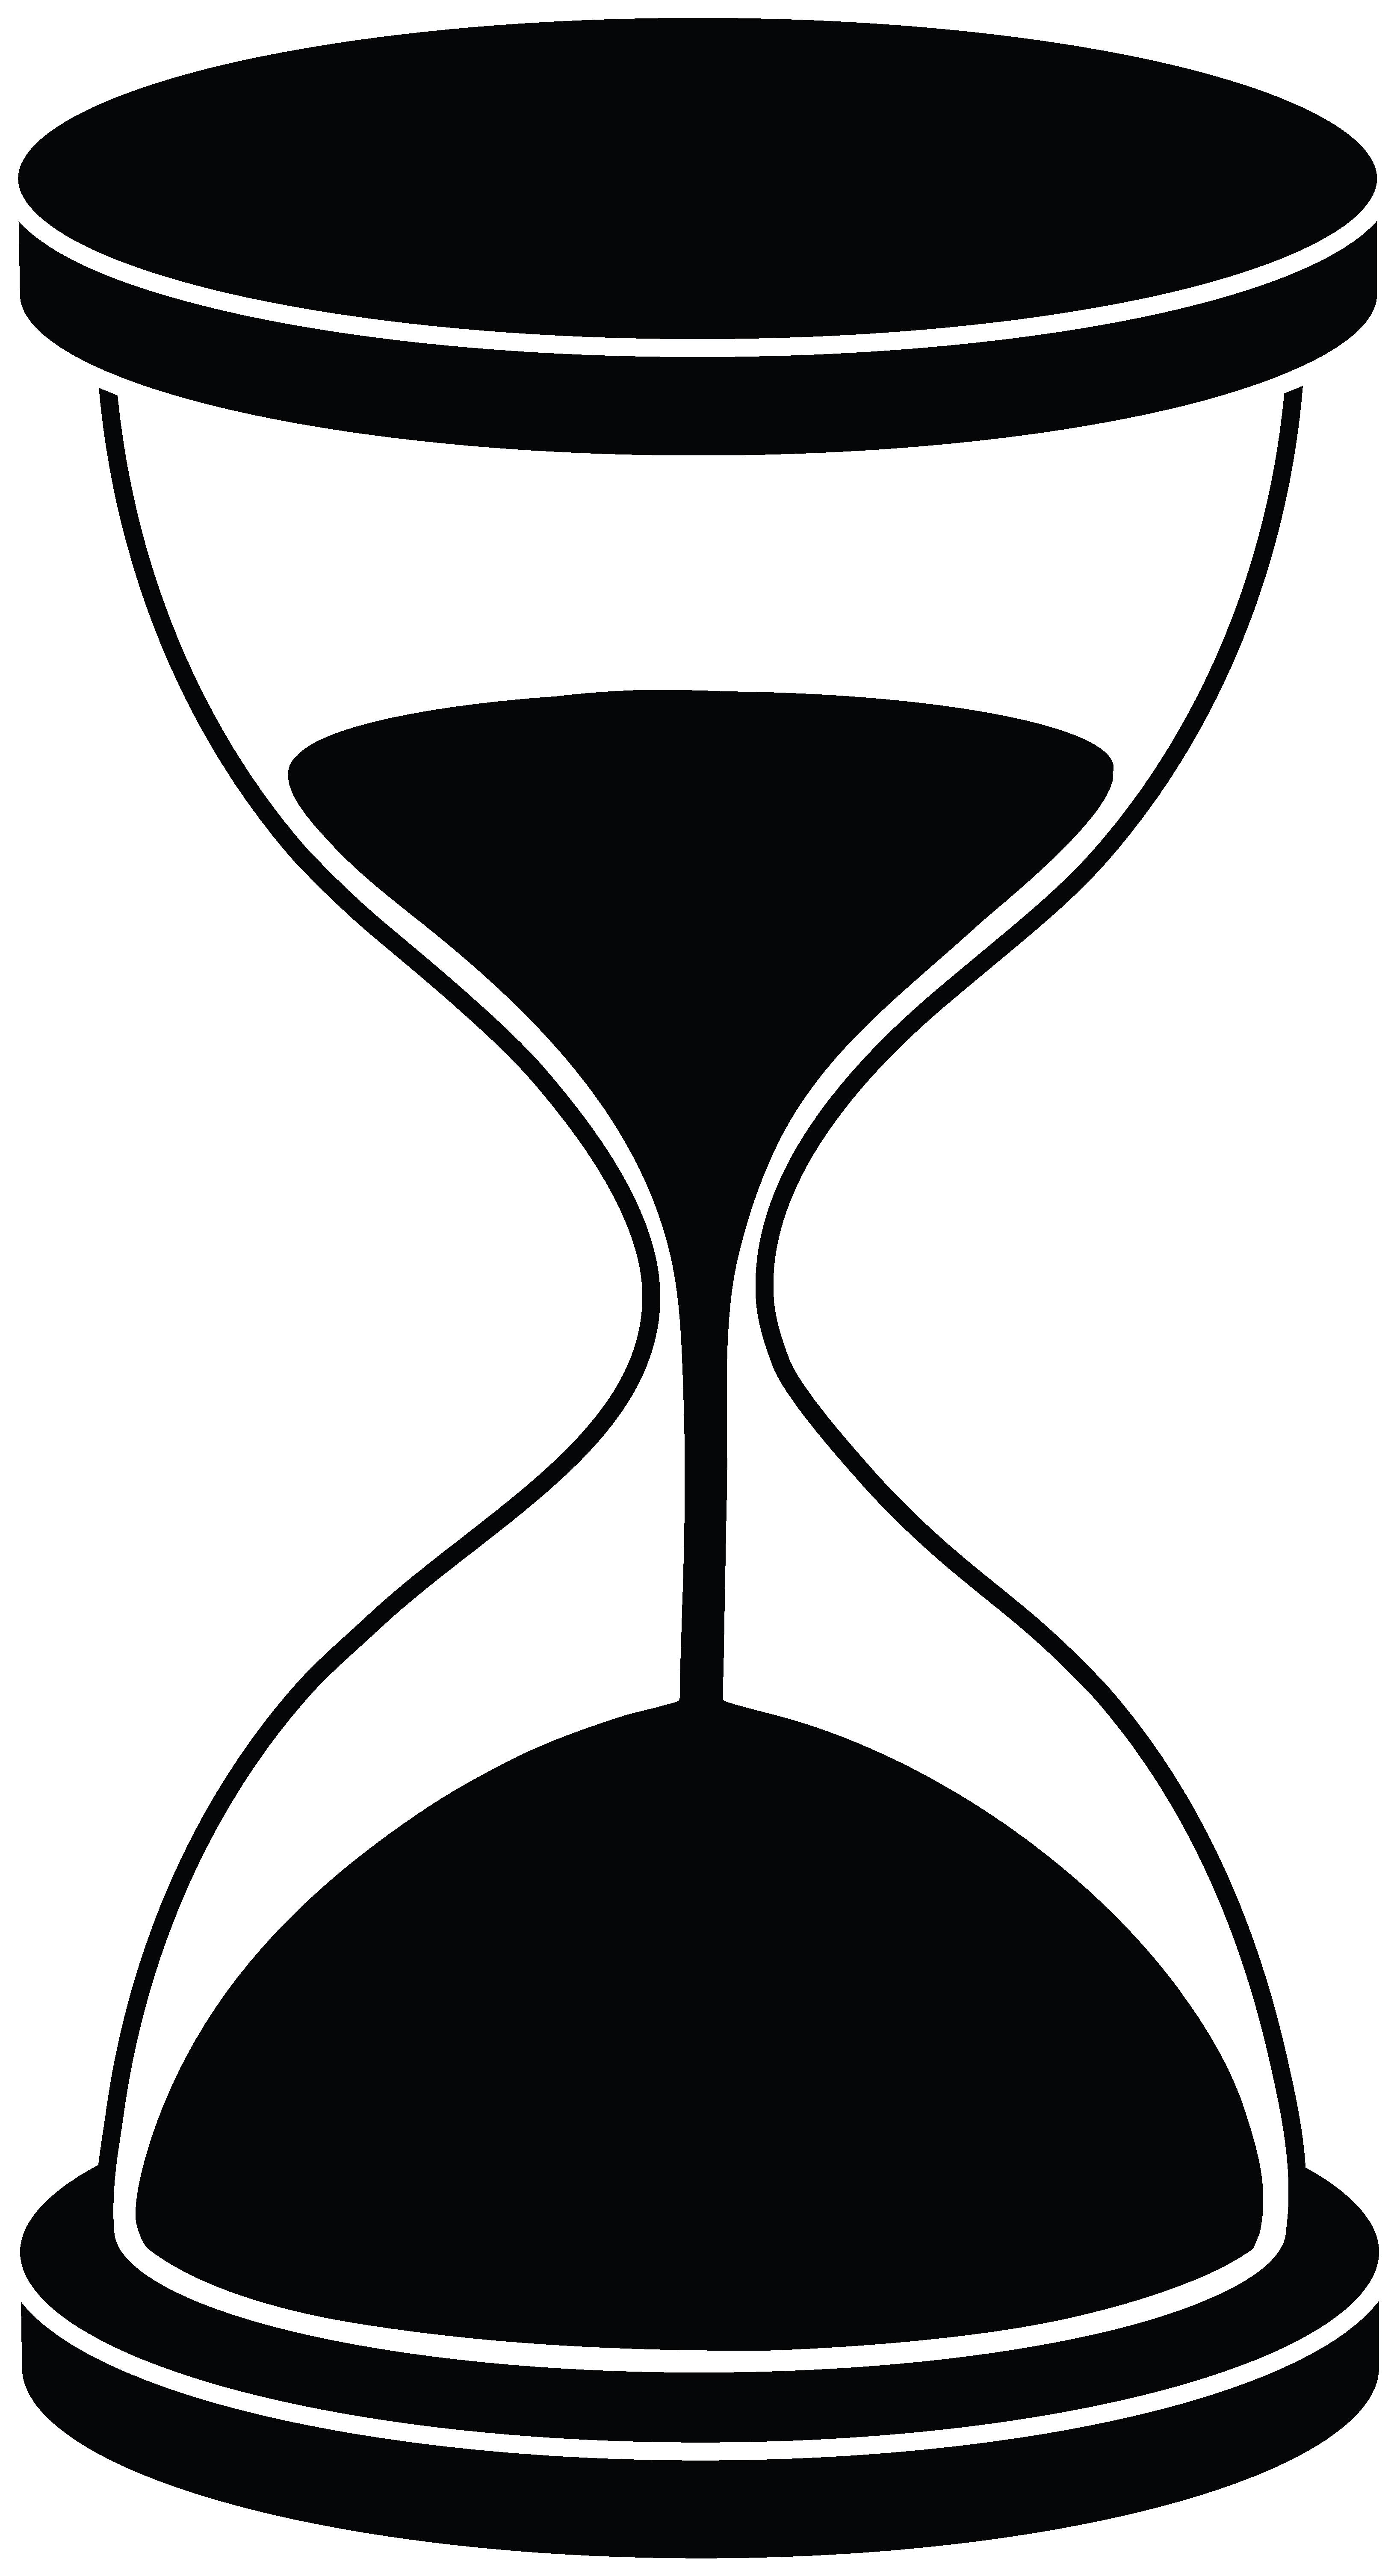 Hourglass clipart Hourglass & com Clip Hourglass